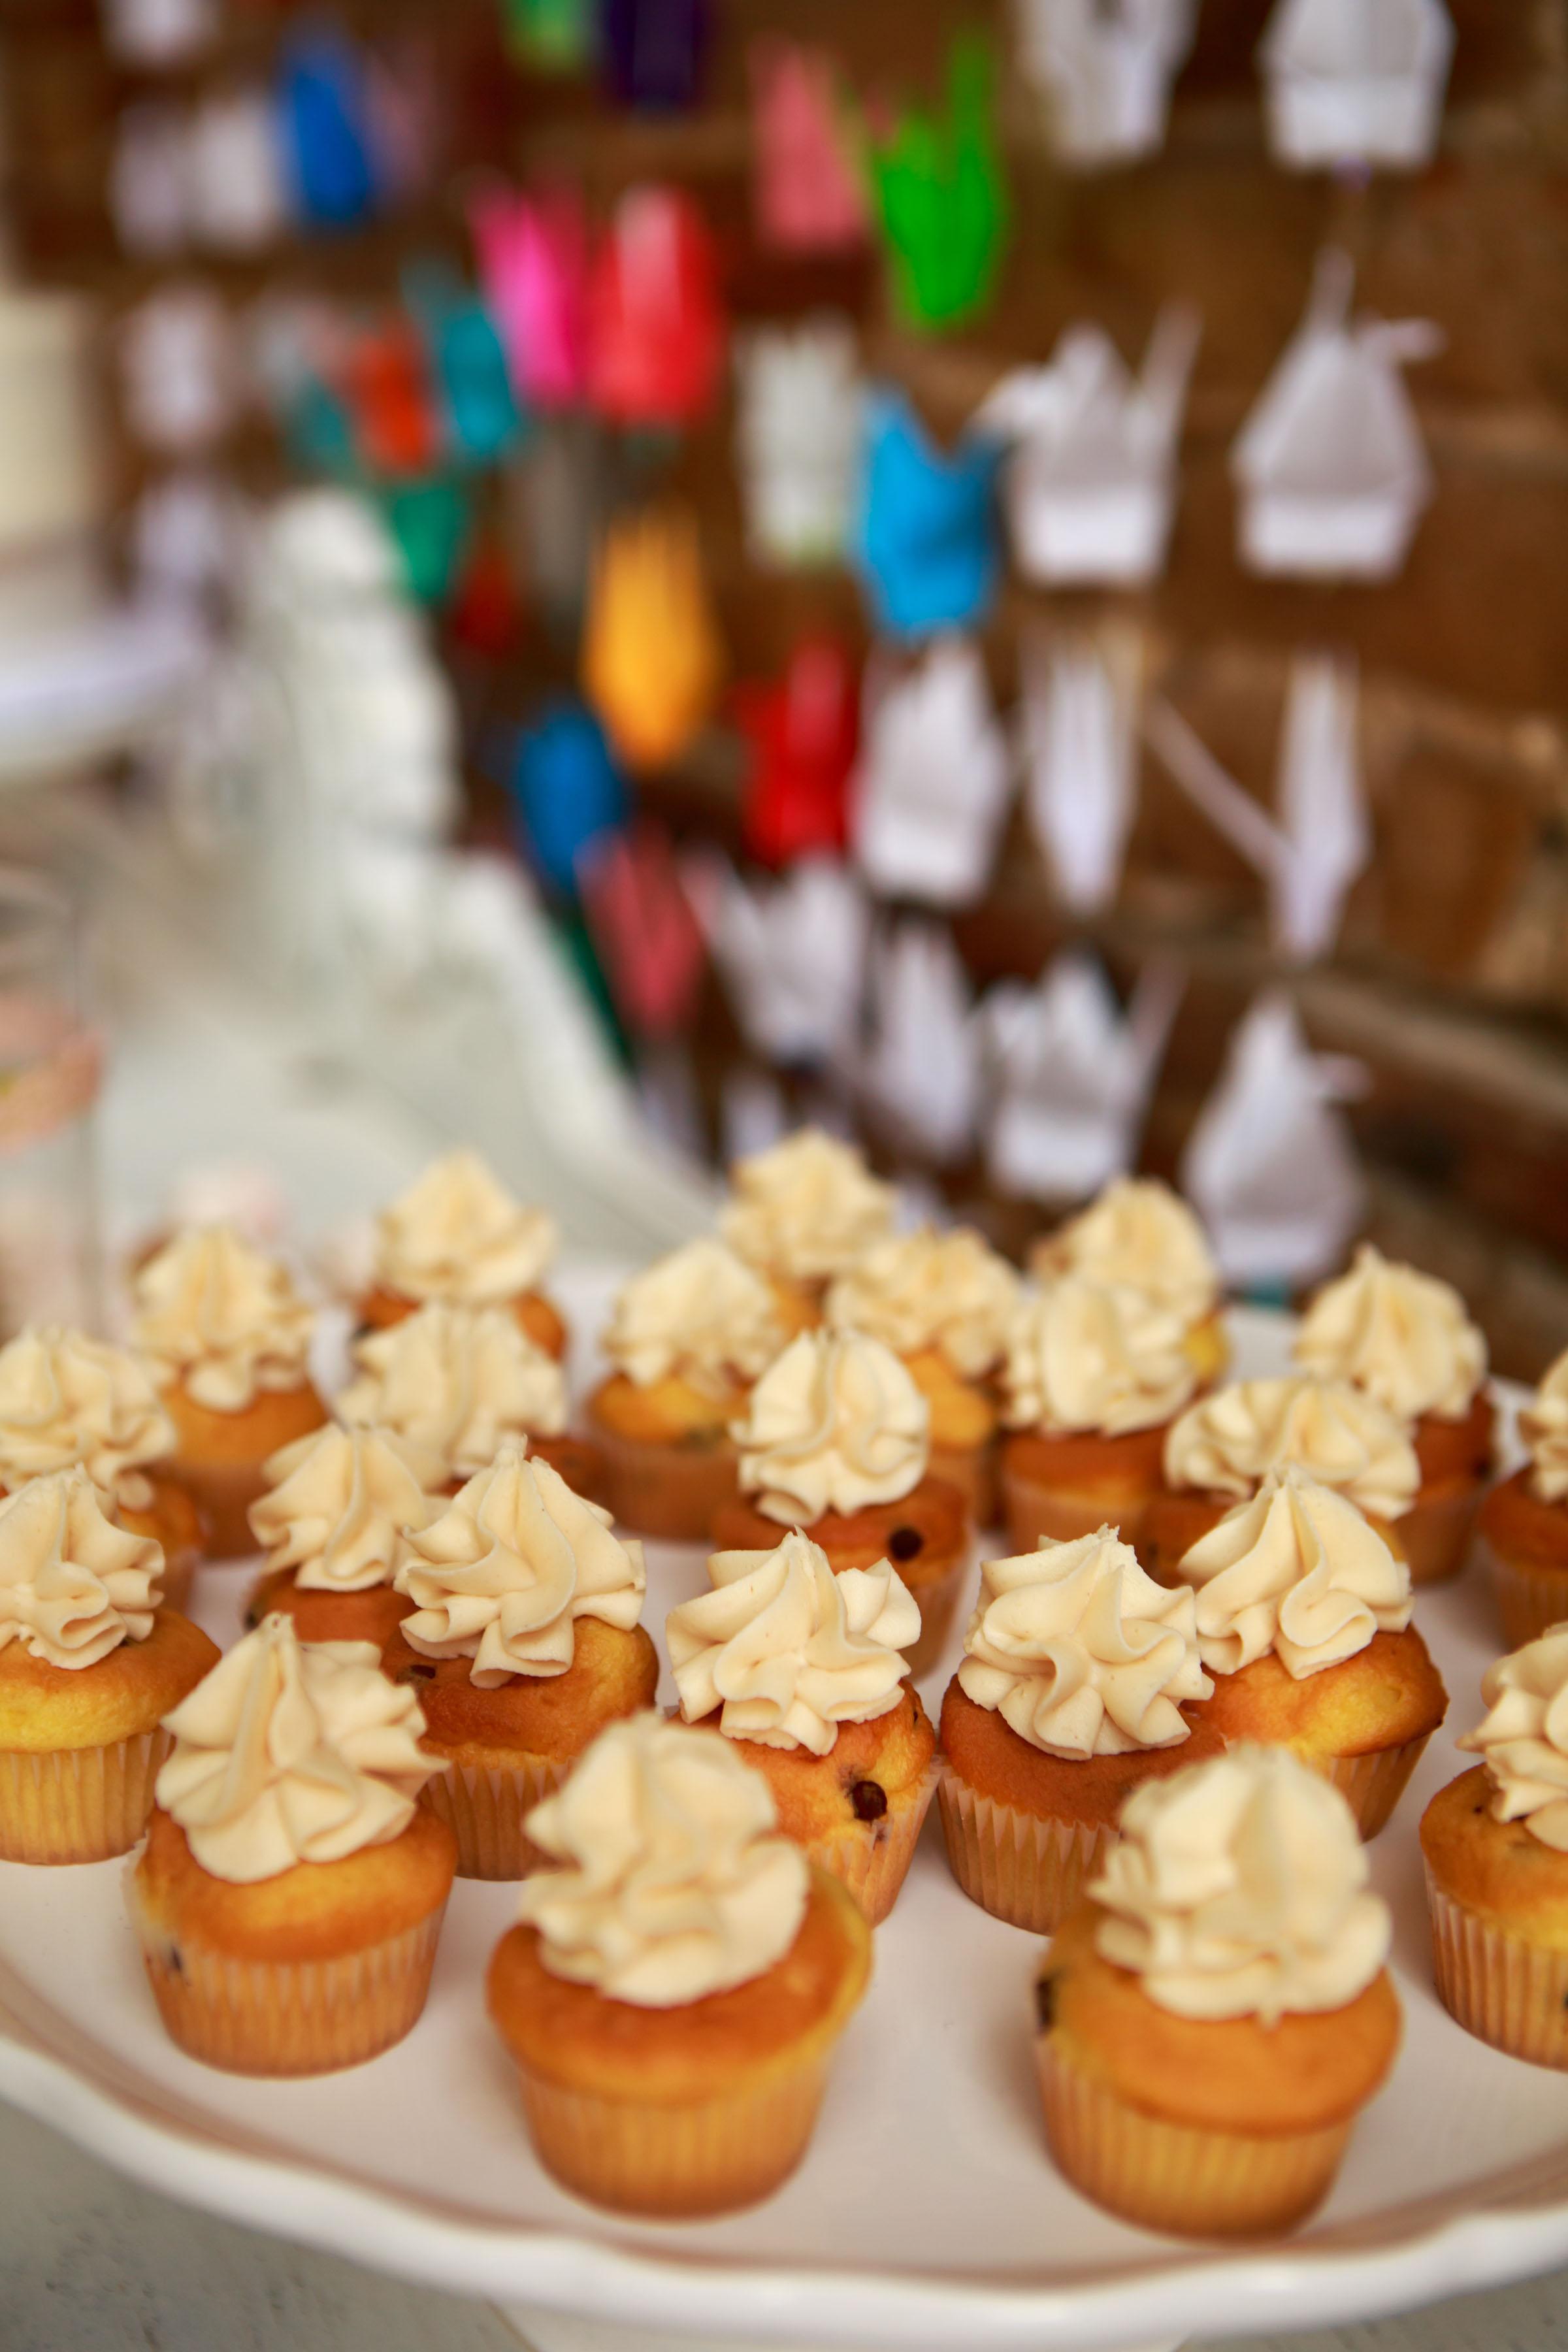 128-South-Wedding-Tiffany-Abruzzo-Photography-Details-14.jpg